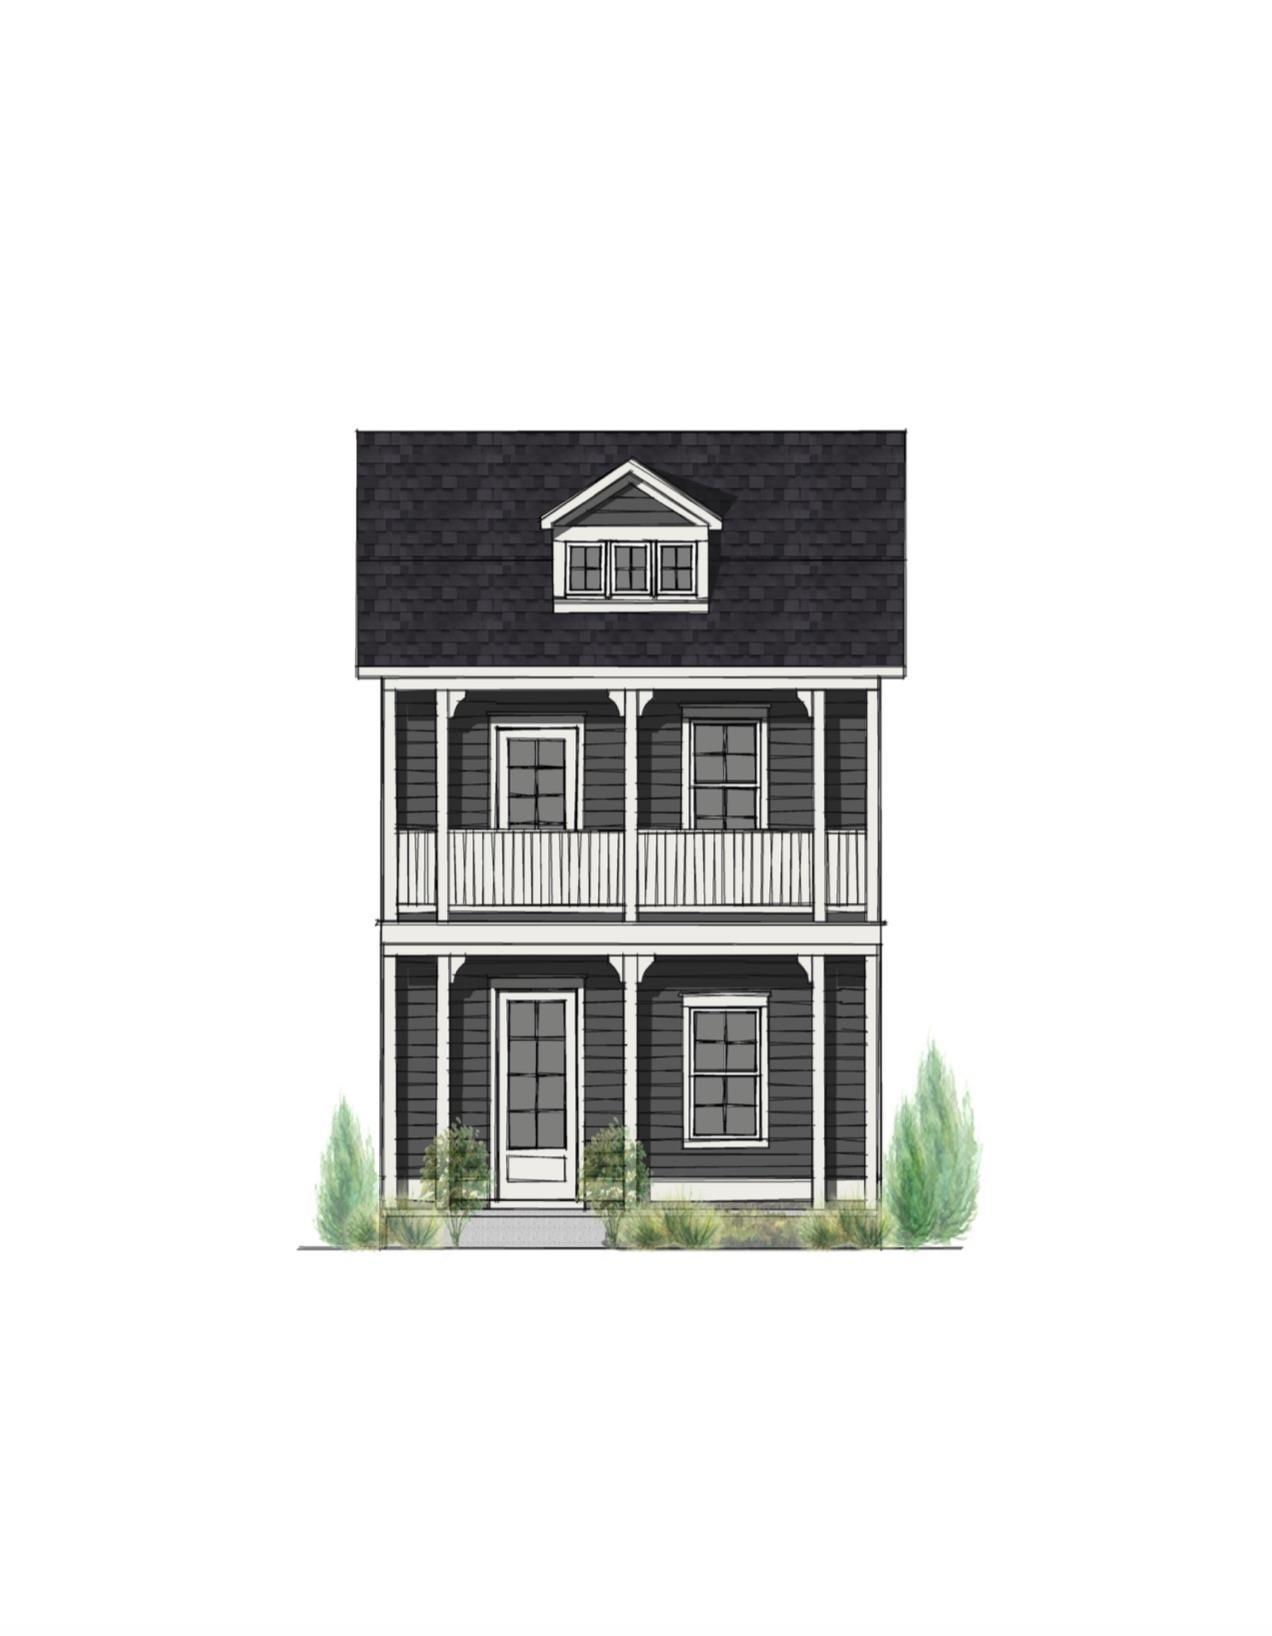 1319A Meridian St, Nashville, TN 37207 - Nashville, TN real estate listing